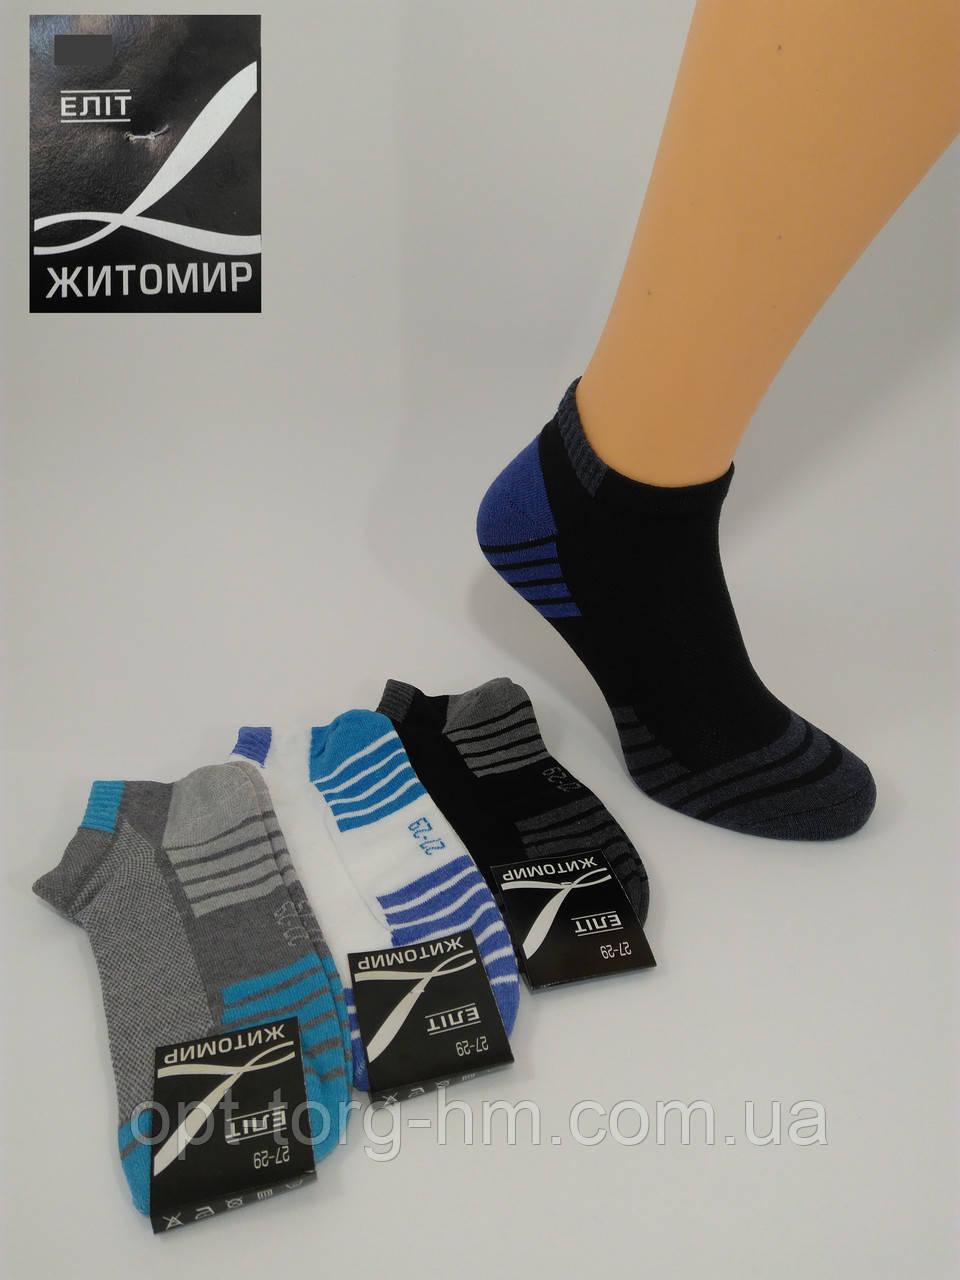 Мужские носки спорт сетка 25-27 (39-42ОБУВЬ)